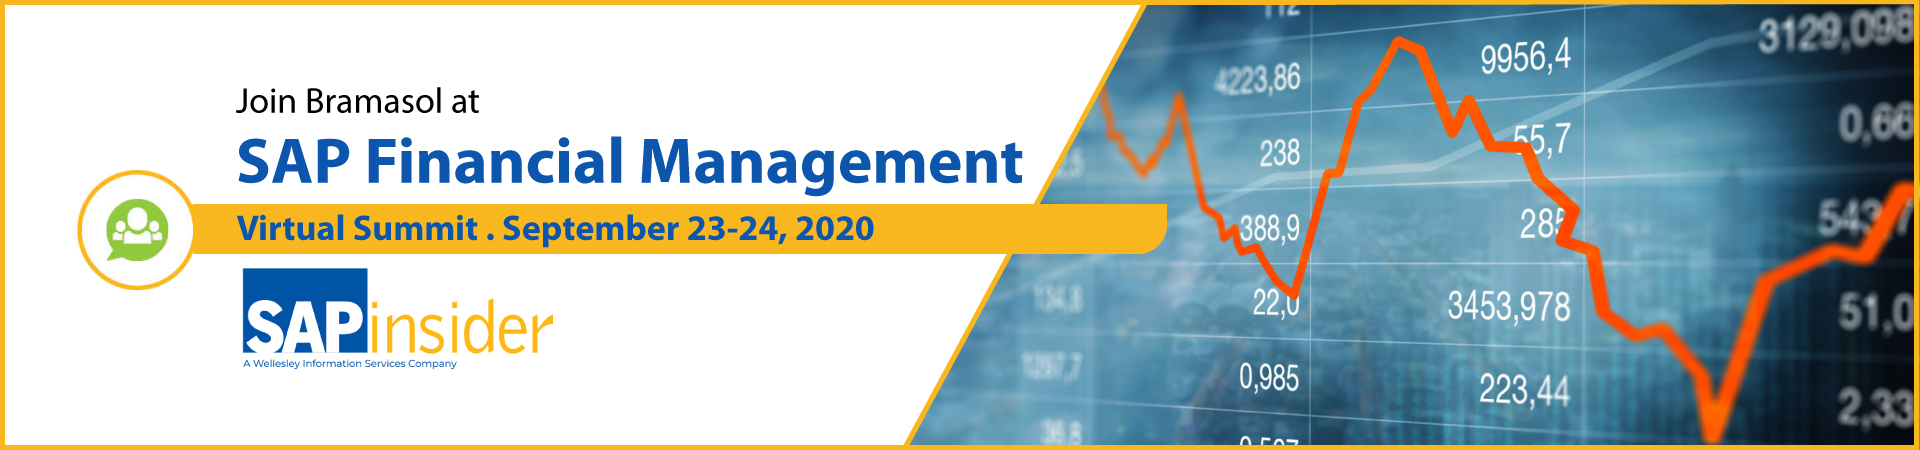 SAPinsider Financial Management Virtual Summit